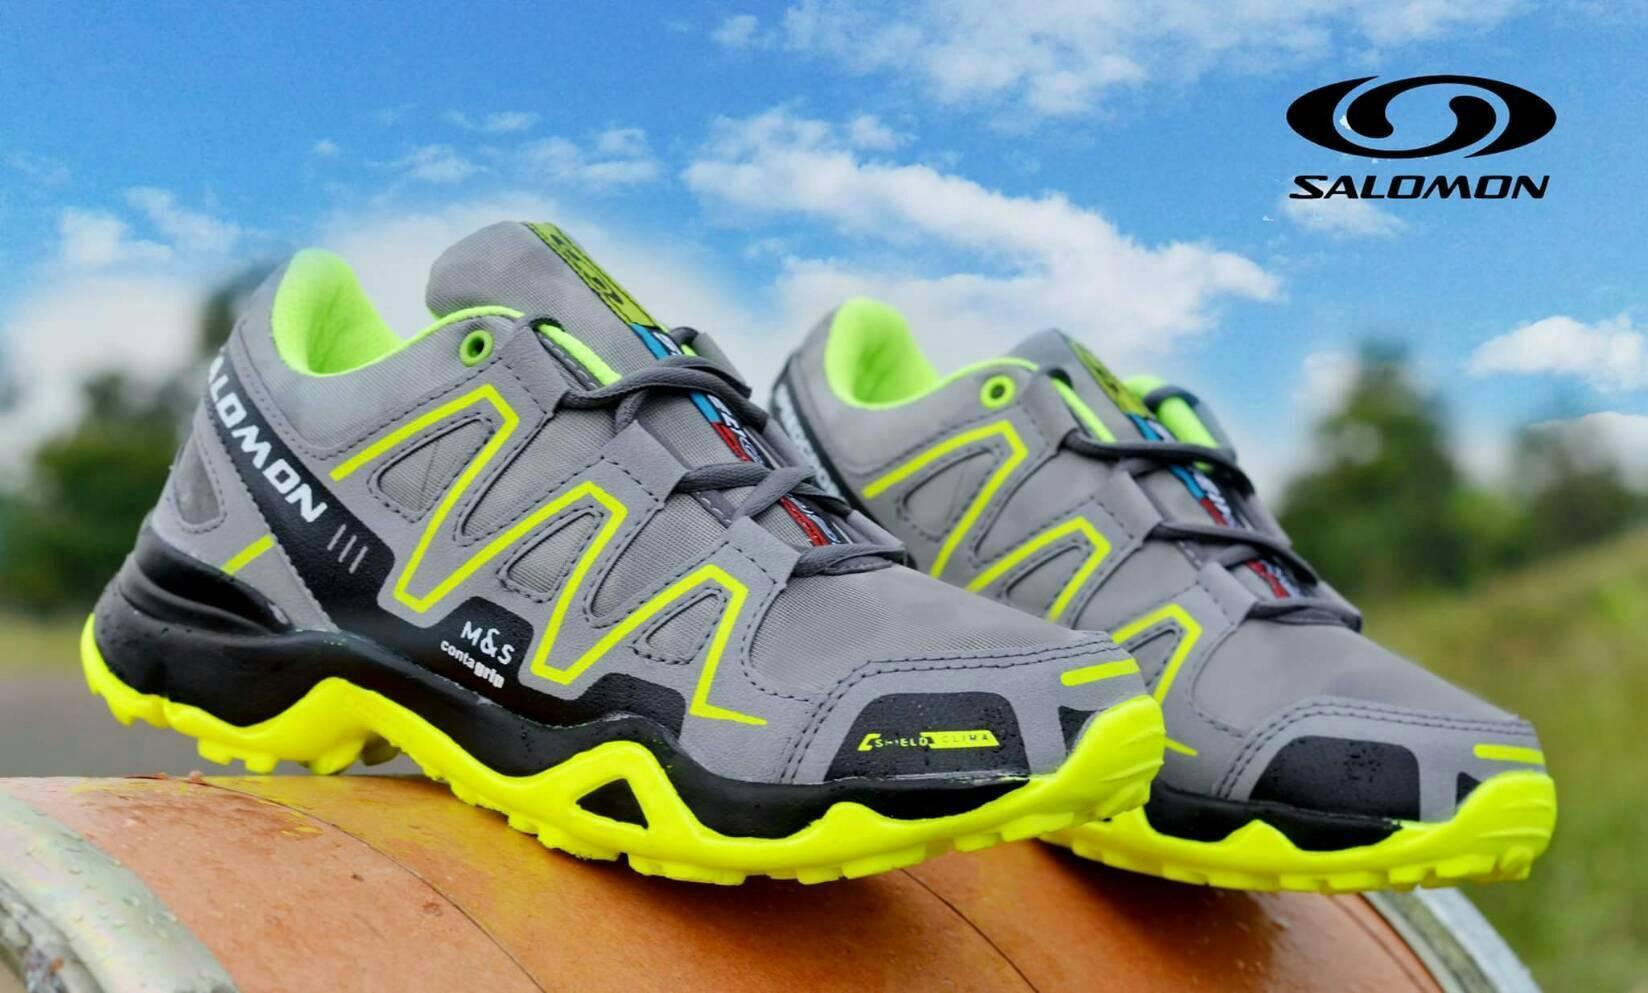 Sepatu Sport Pria Adidas Tracking Salomon Import (Sepatu Olahraga, Sepatu Kerja, Sepatu Gunung, Sepatu Hiking, Sepatu Sekolah, Sepatu Joging, Lapangan, Sepatu Kulit, Sneaker, Slip On, Slop, Casual ,BOOTS, SEPATU VANS,Adidas, Nike, Pria, Wanita, Anak)